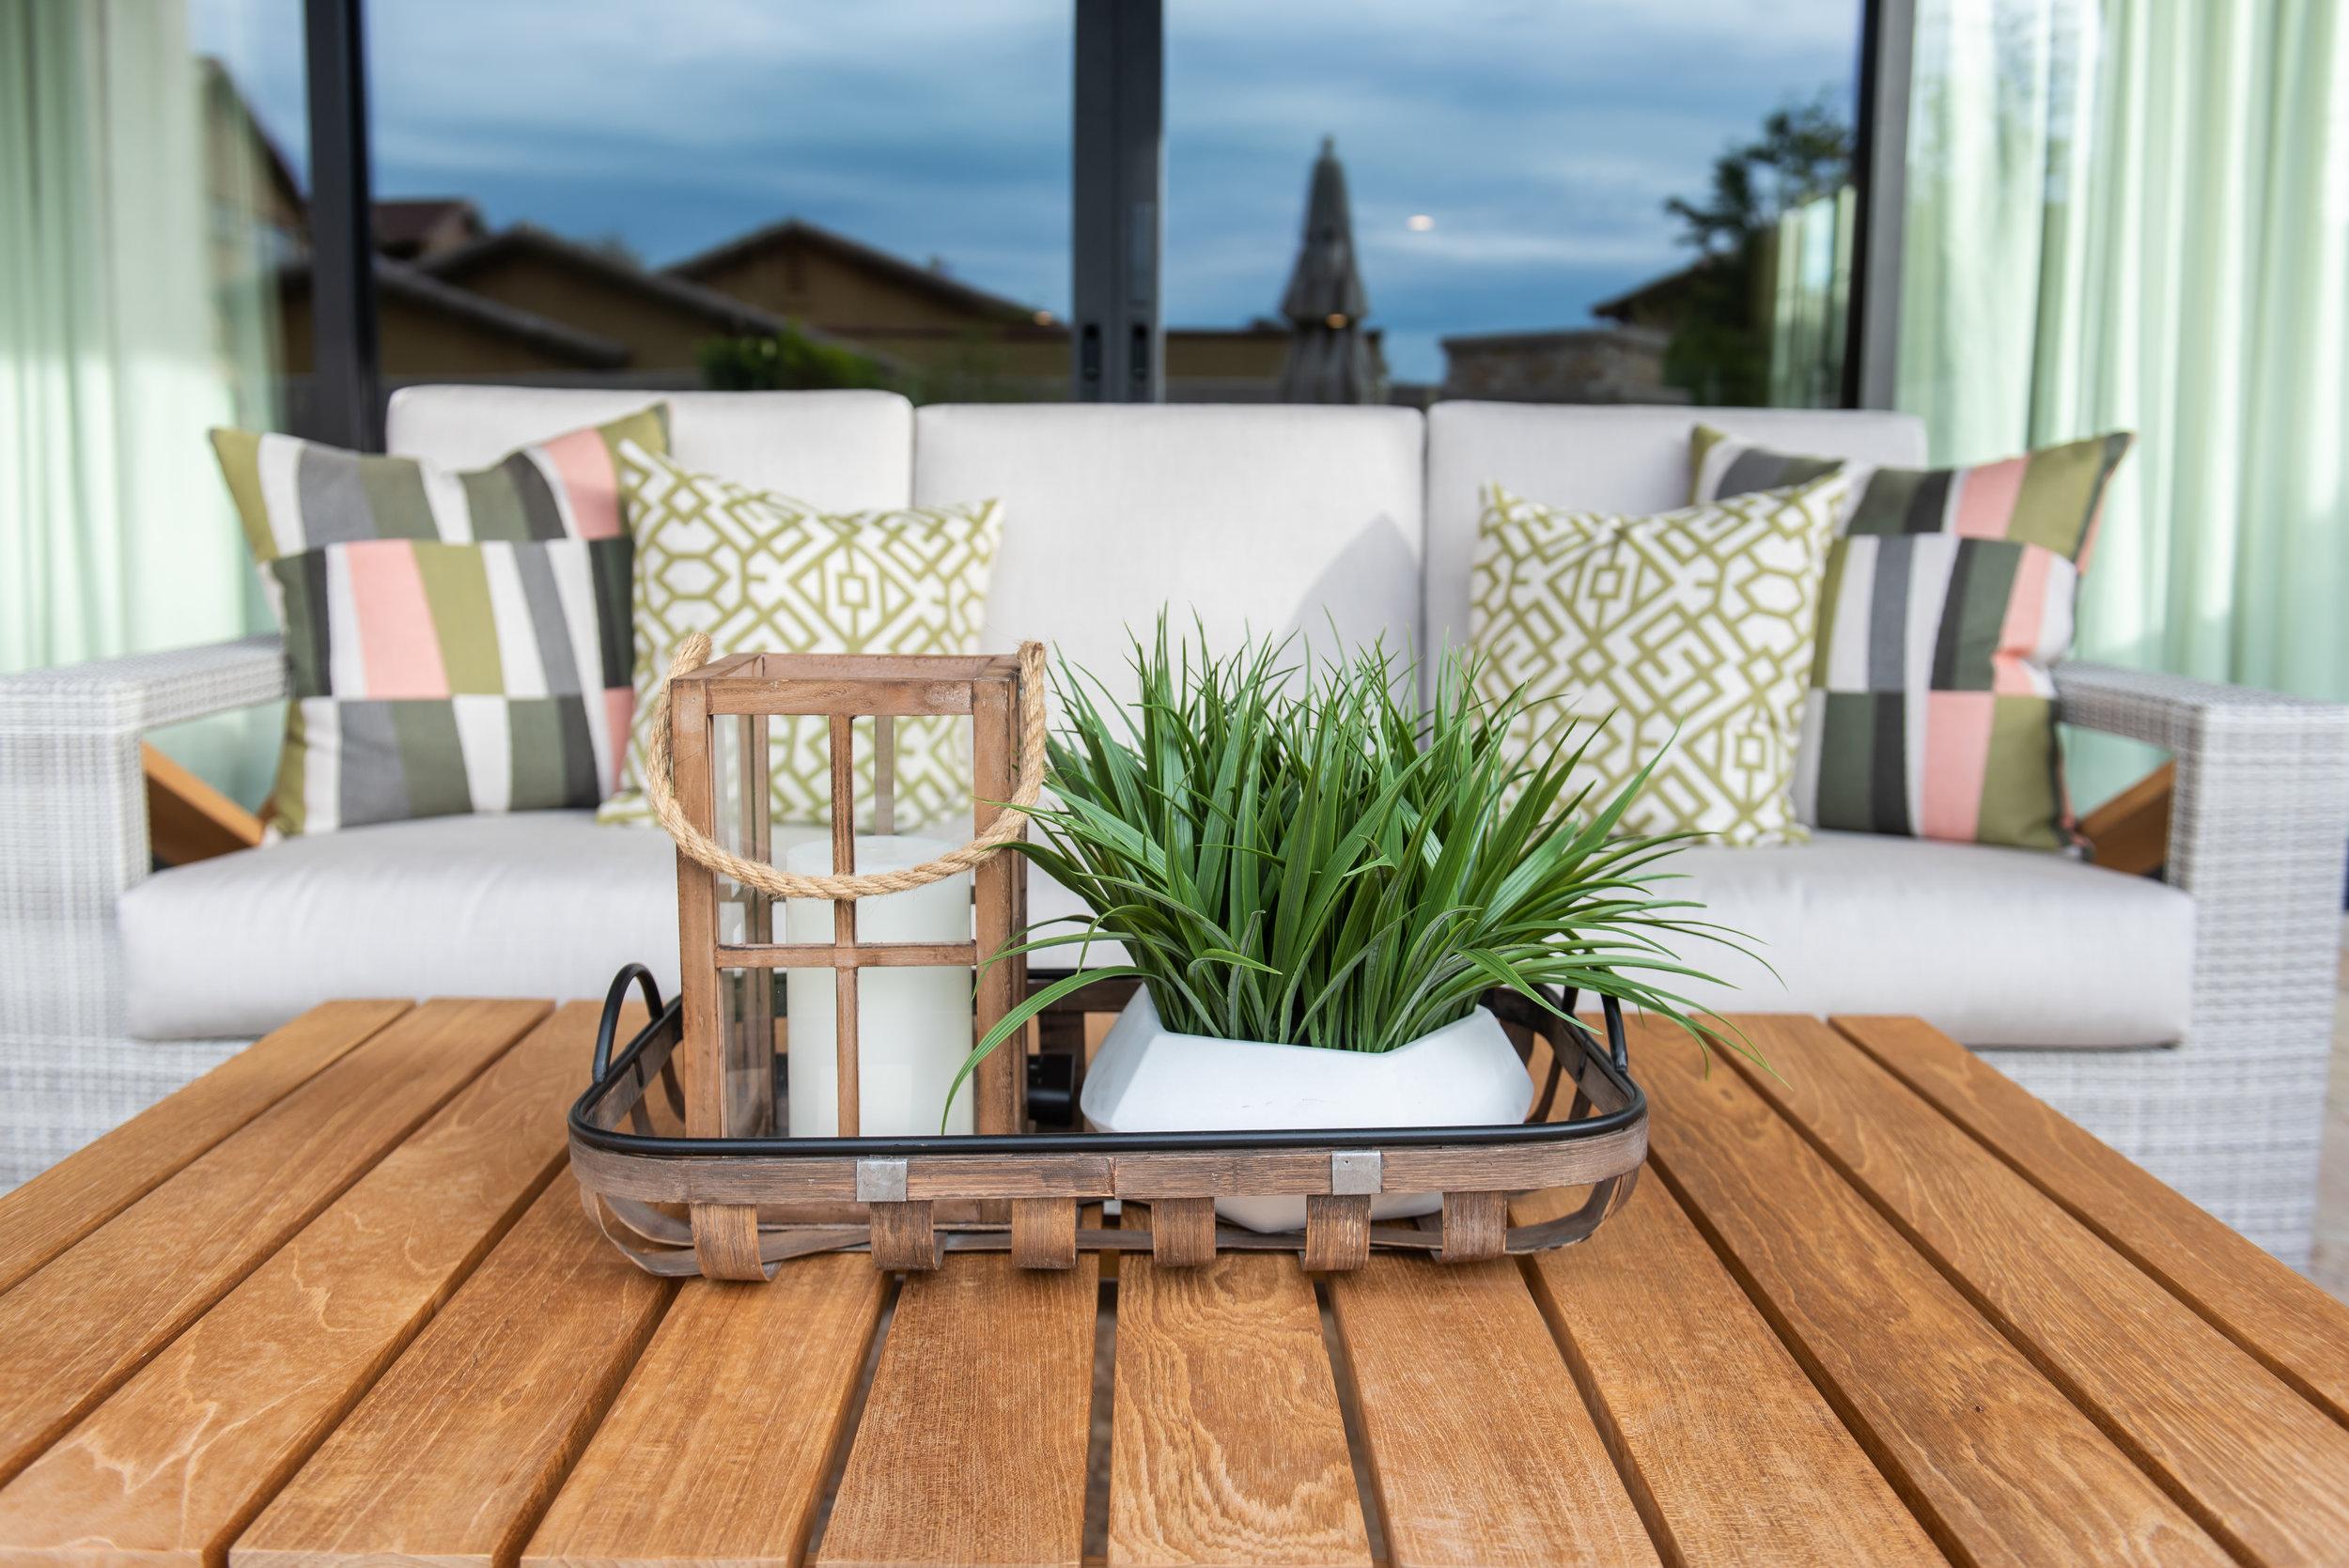 Backyard +patio +outdoor +furniture +pillows +coffeetable +plant.jpg